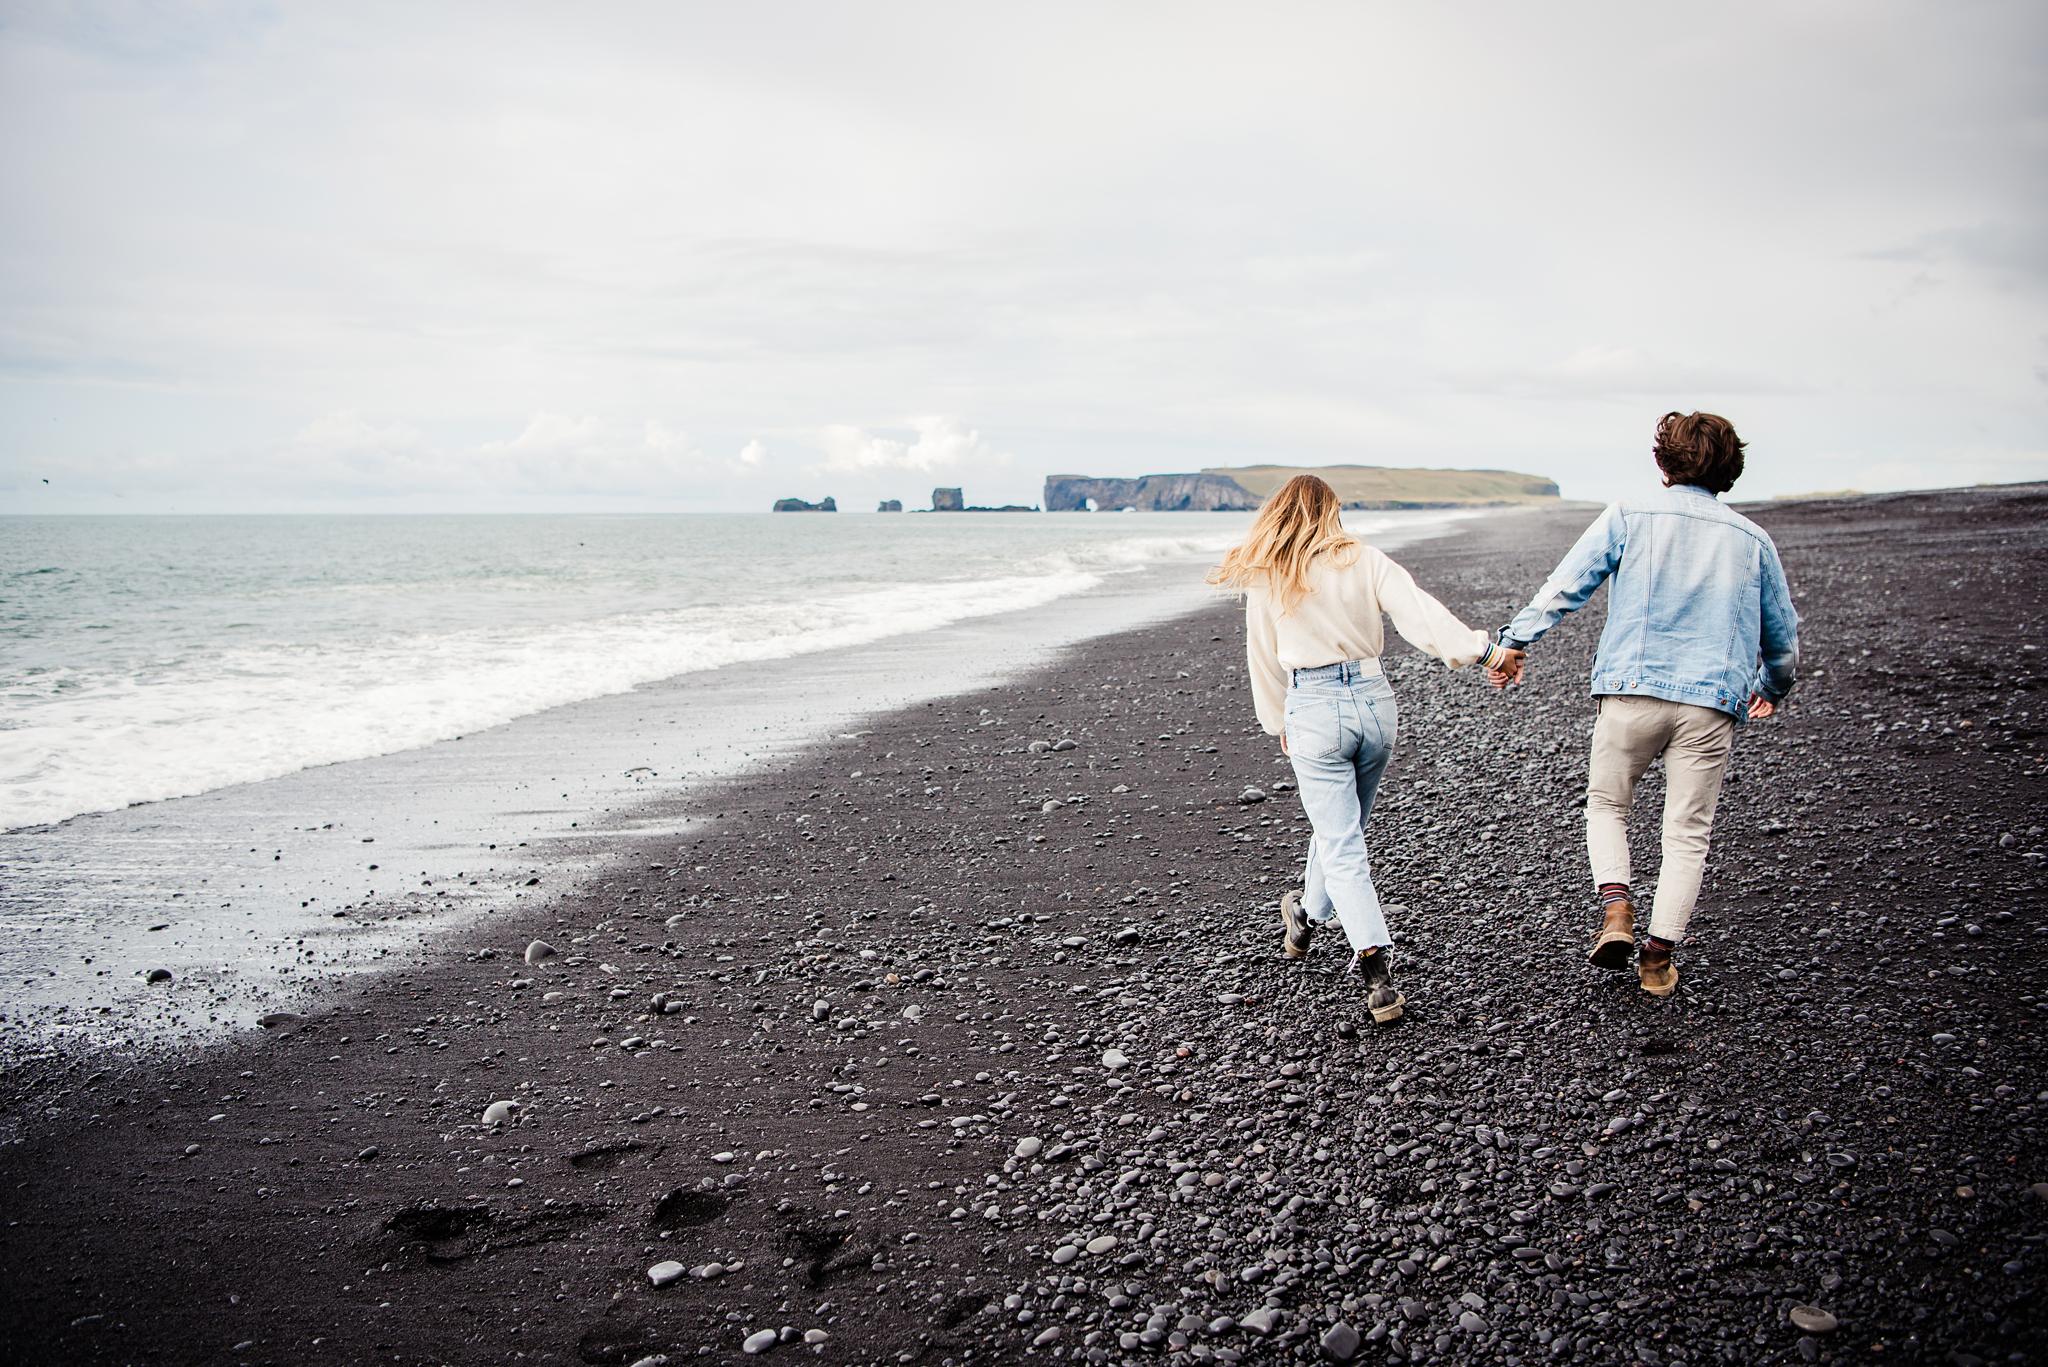 Iceland_Reynisfjara_Black_Sand_Beach_Couples_Session_JILL_STUDIO_Rochester_NY_Photographer_DSC_9683.jpg